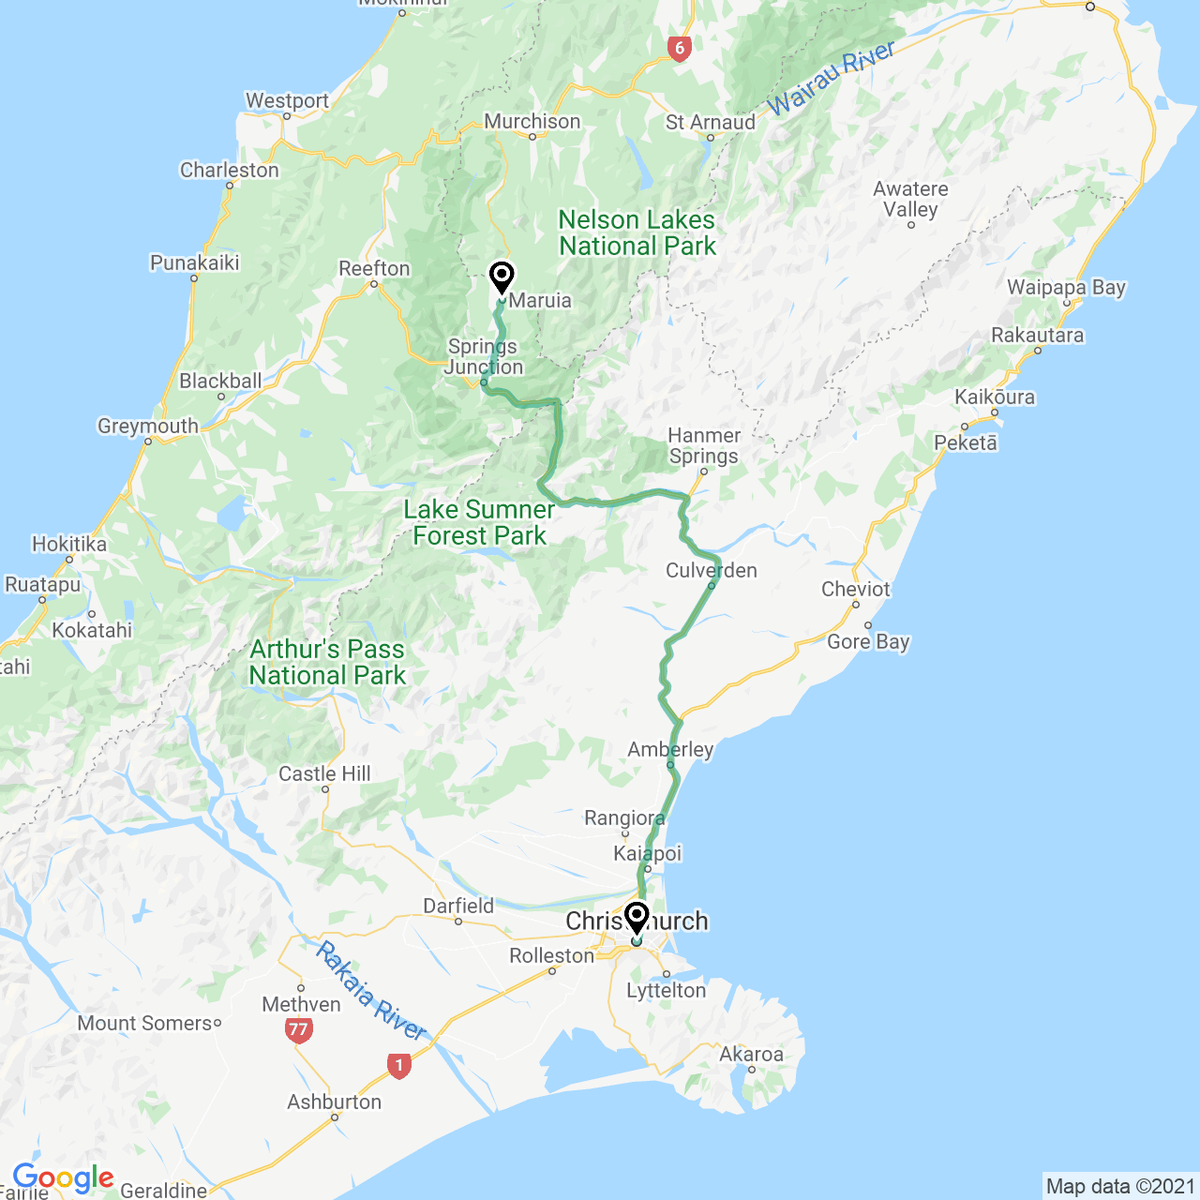 56_sm_1620182624 static map